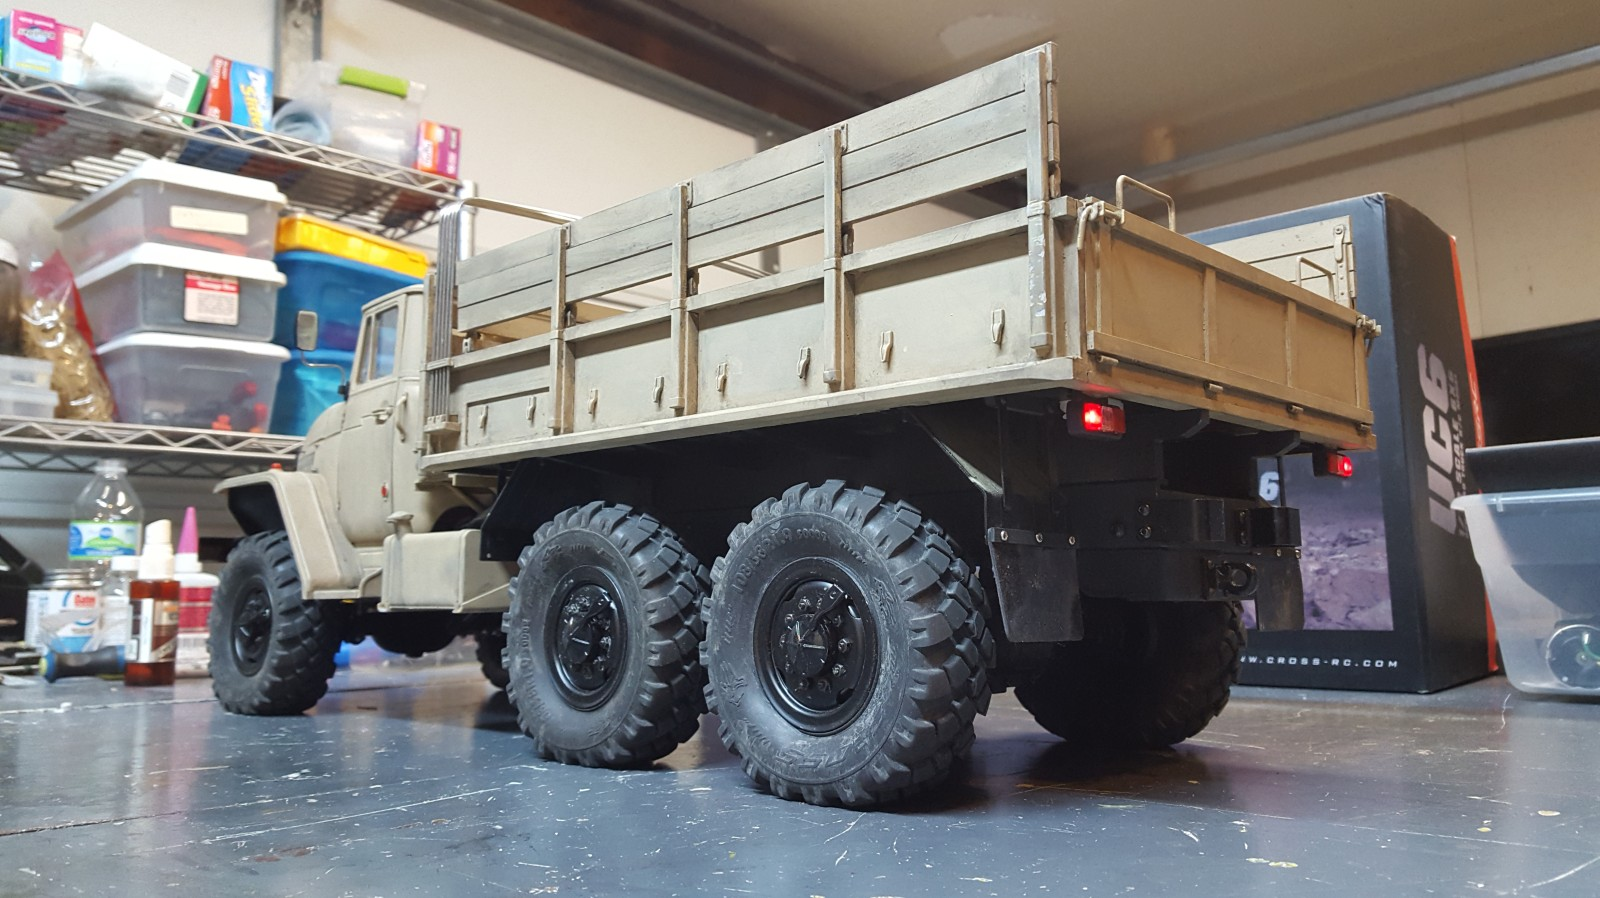 CROSS RC UC6 6x6 Ural Truck - RCU Forums